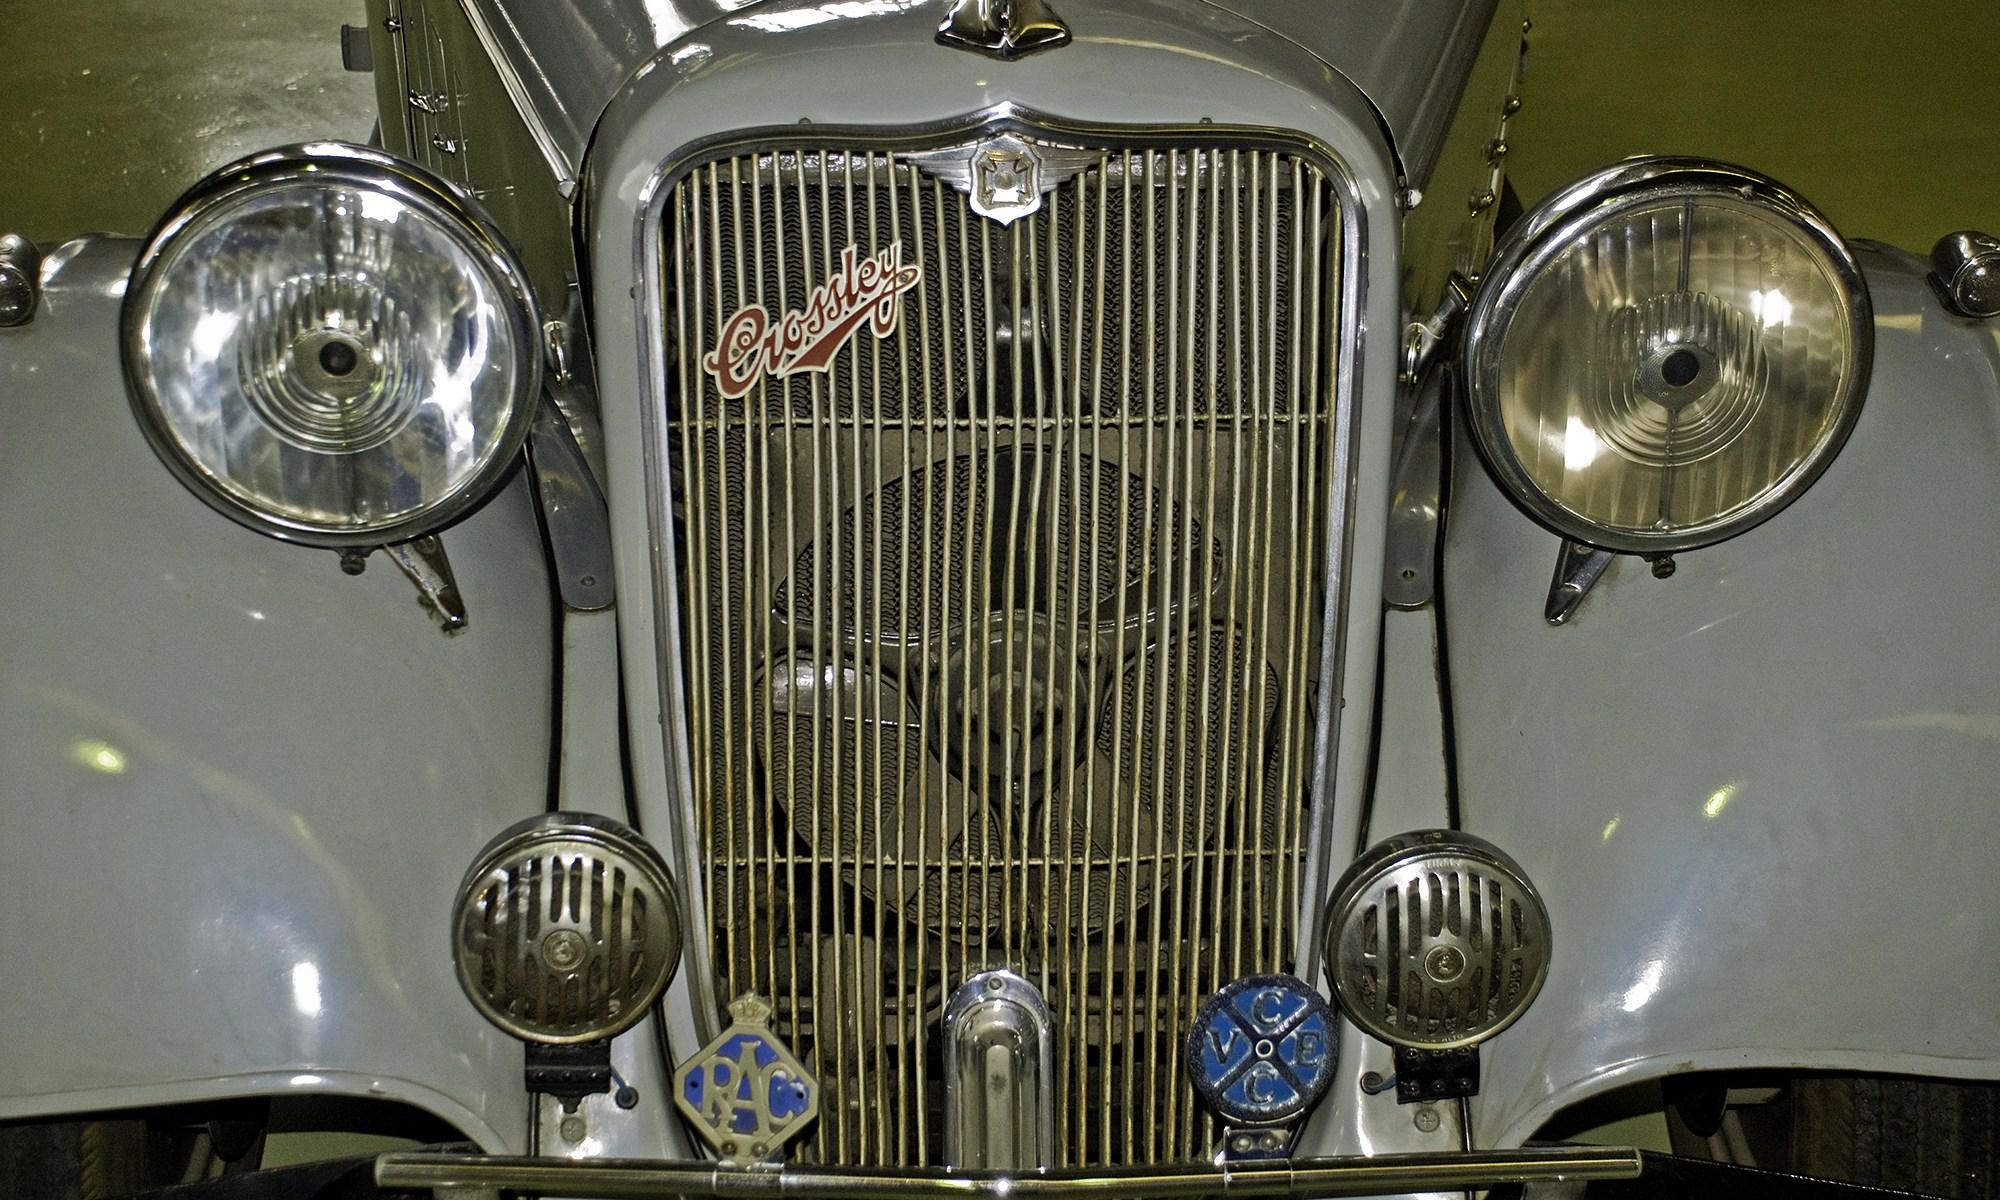 Crossley Regis six Motor Car, 1935